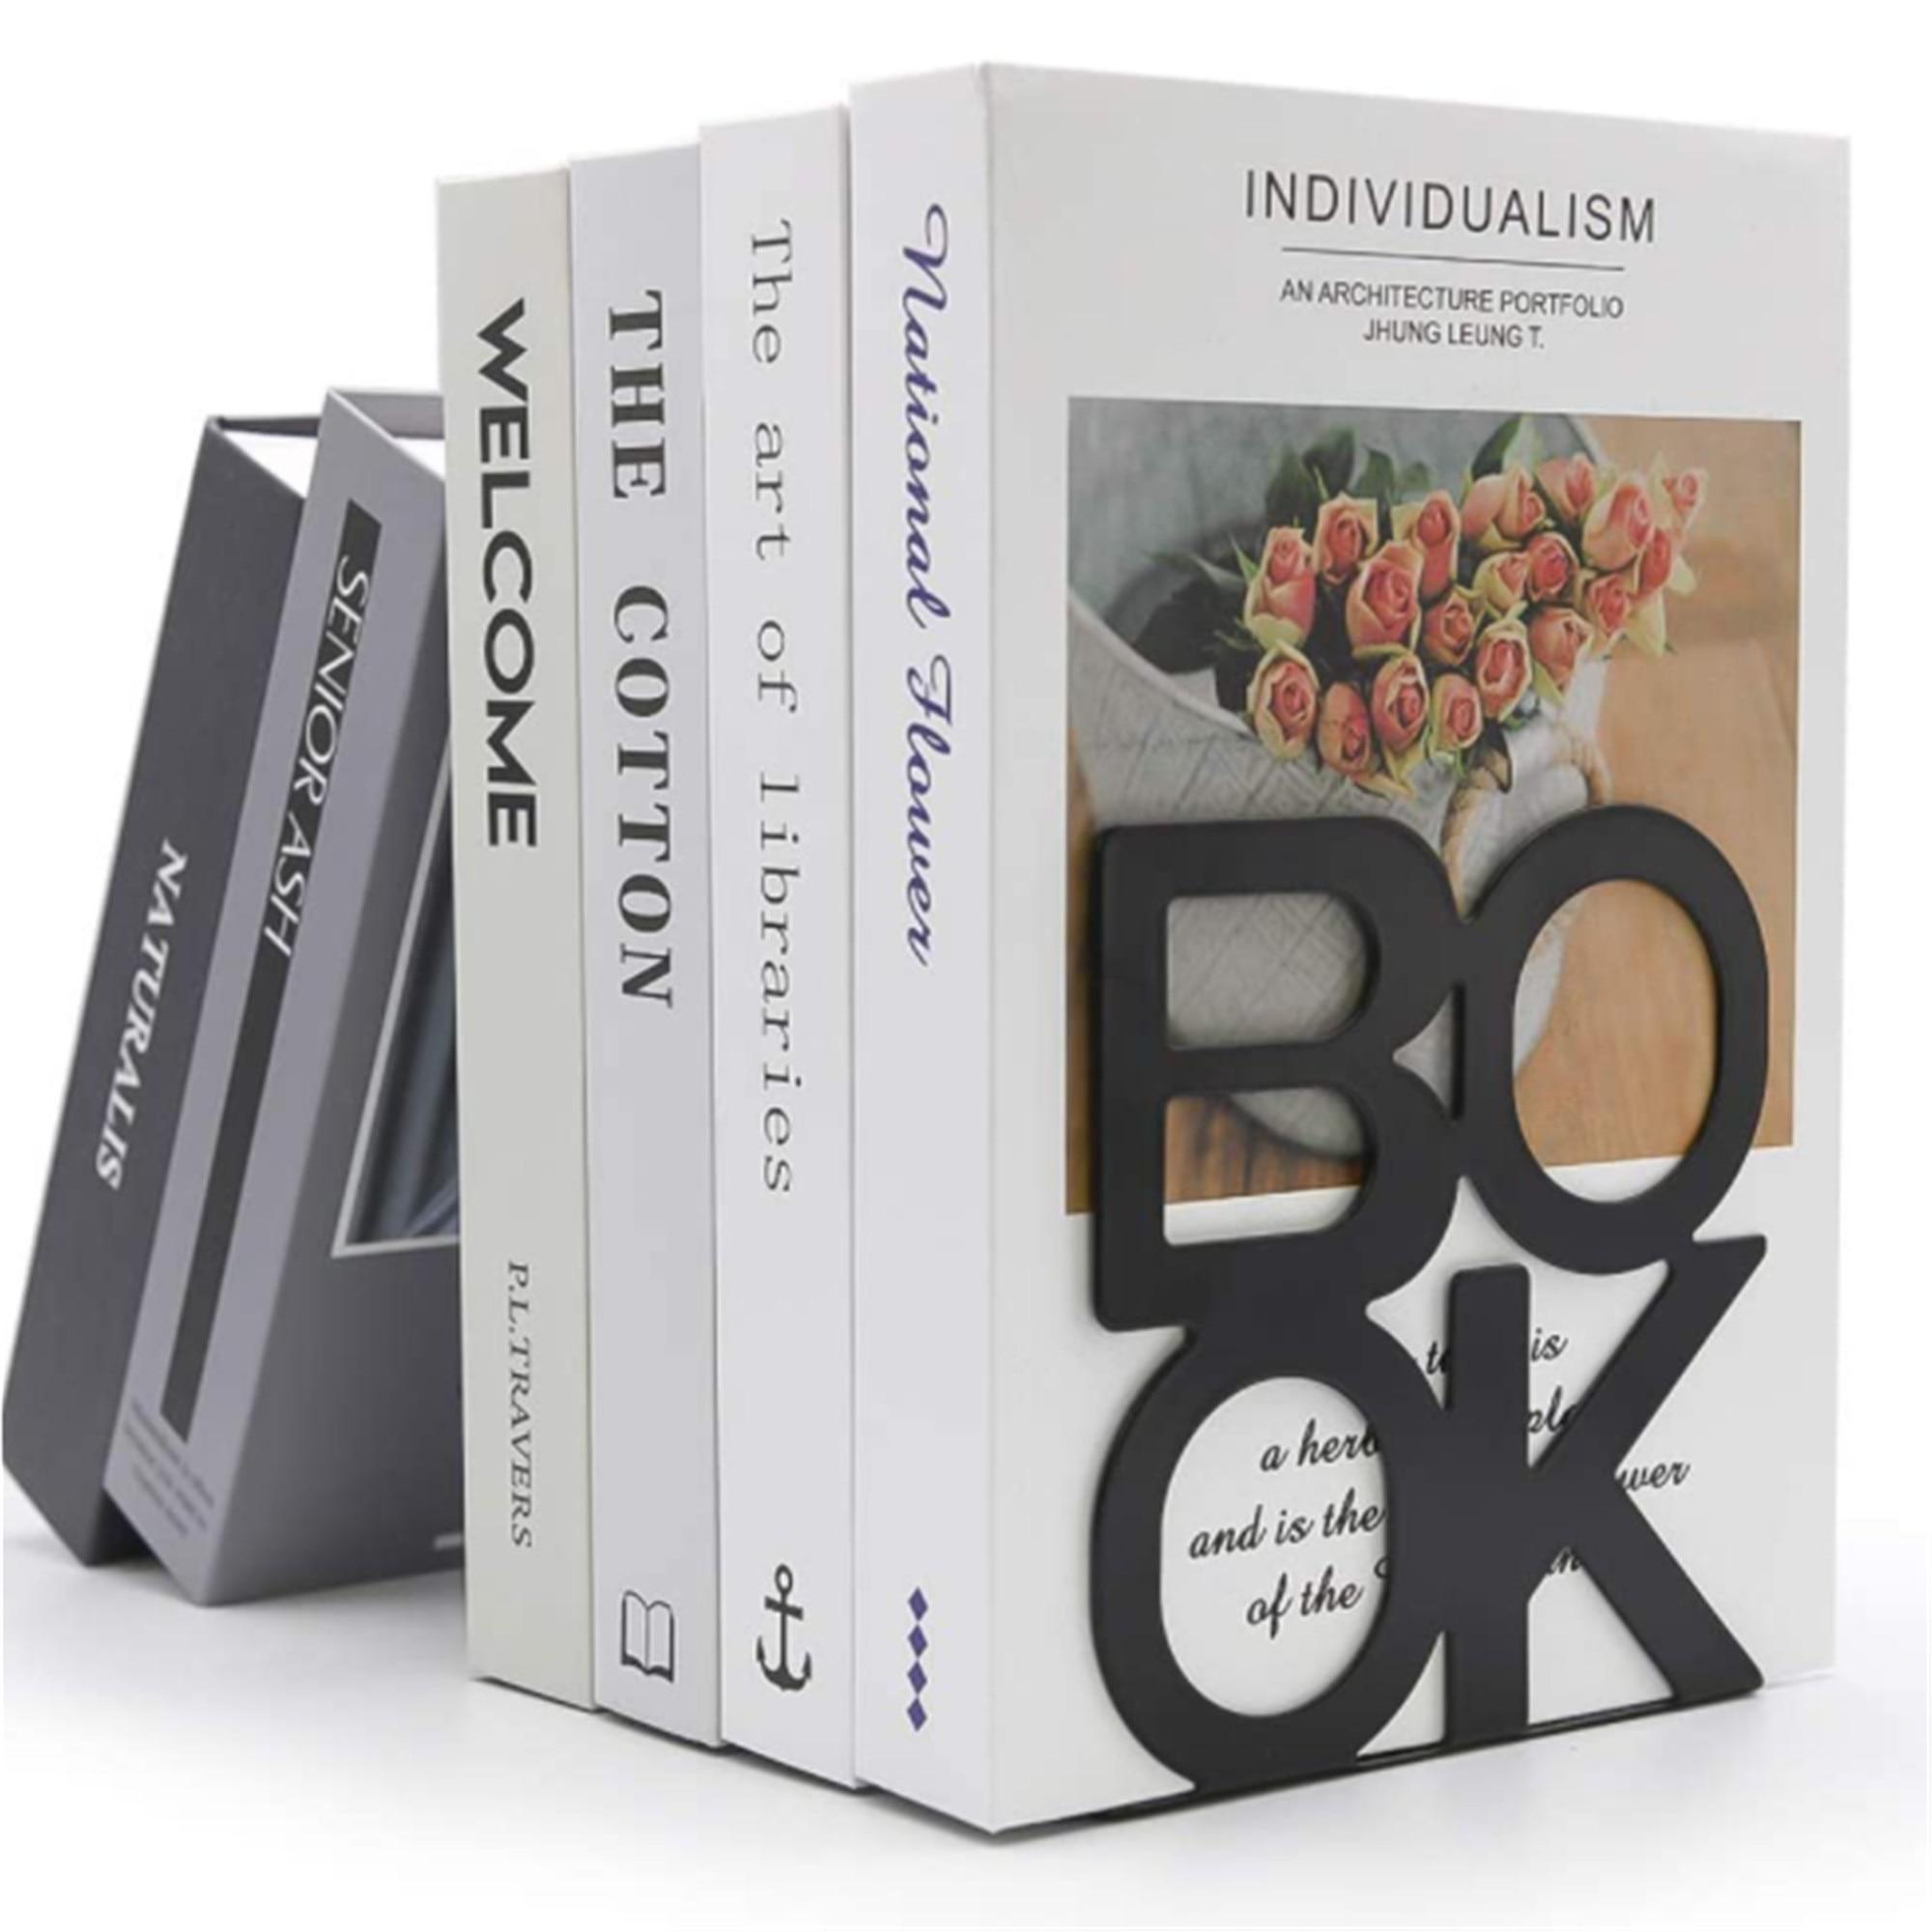 2pcs Bookend Book Stand Support Sample Bookend Iron Desktop Art Non Slip Rack Shelf Holder School Stationery Office Accessories